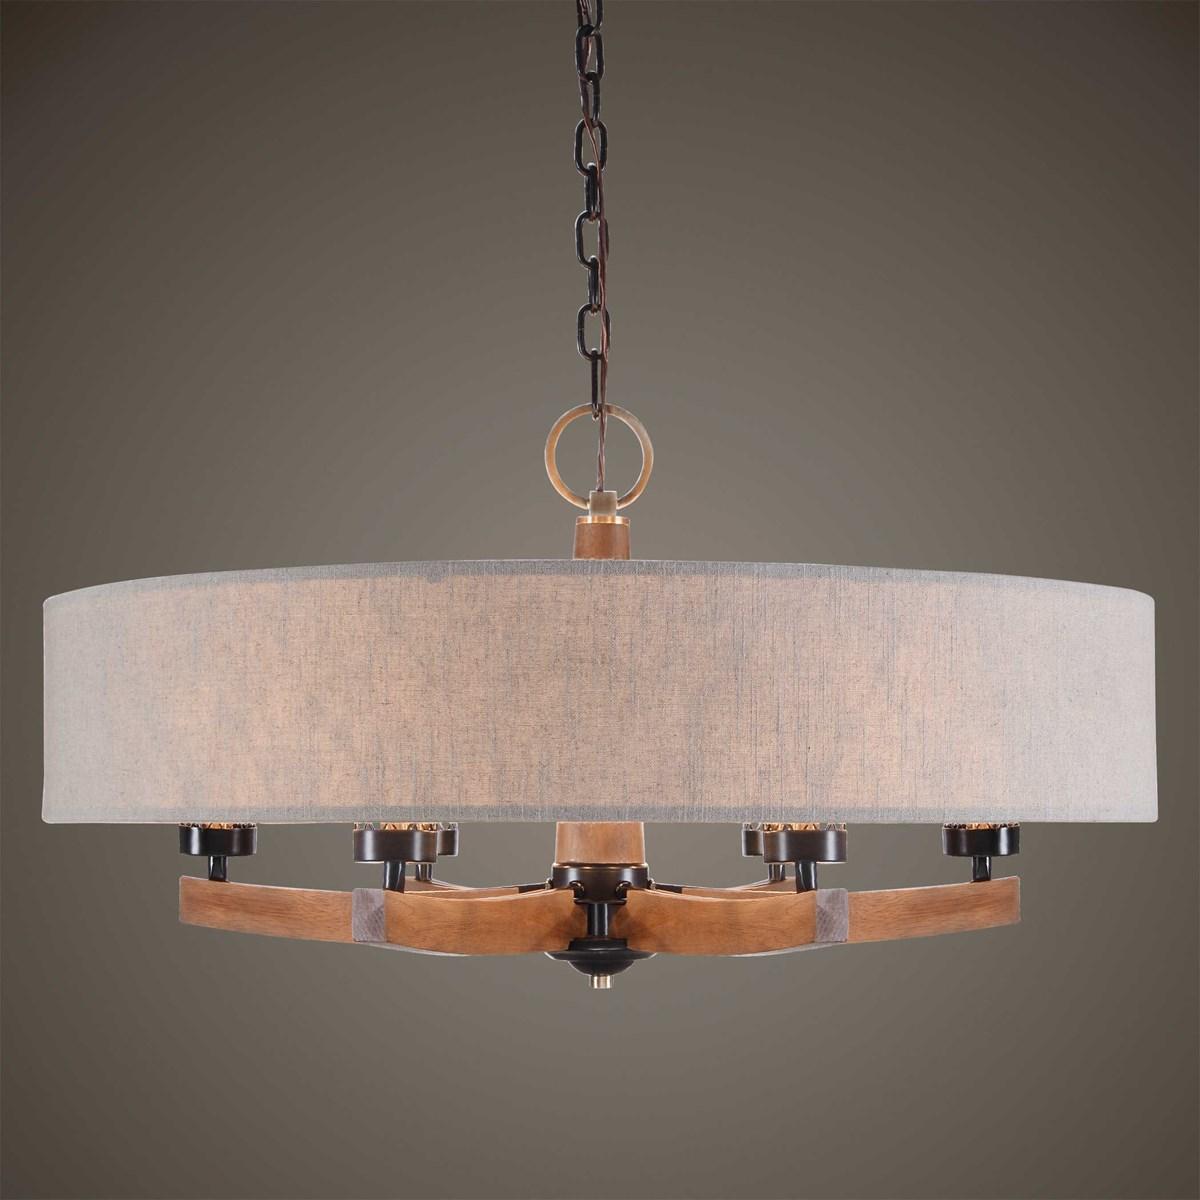 woodall 6 lt. chandelier